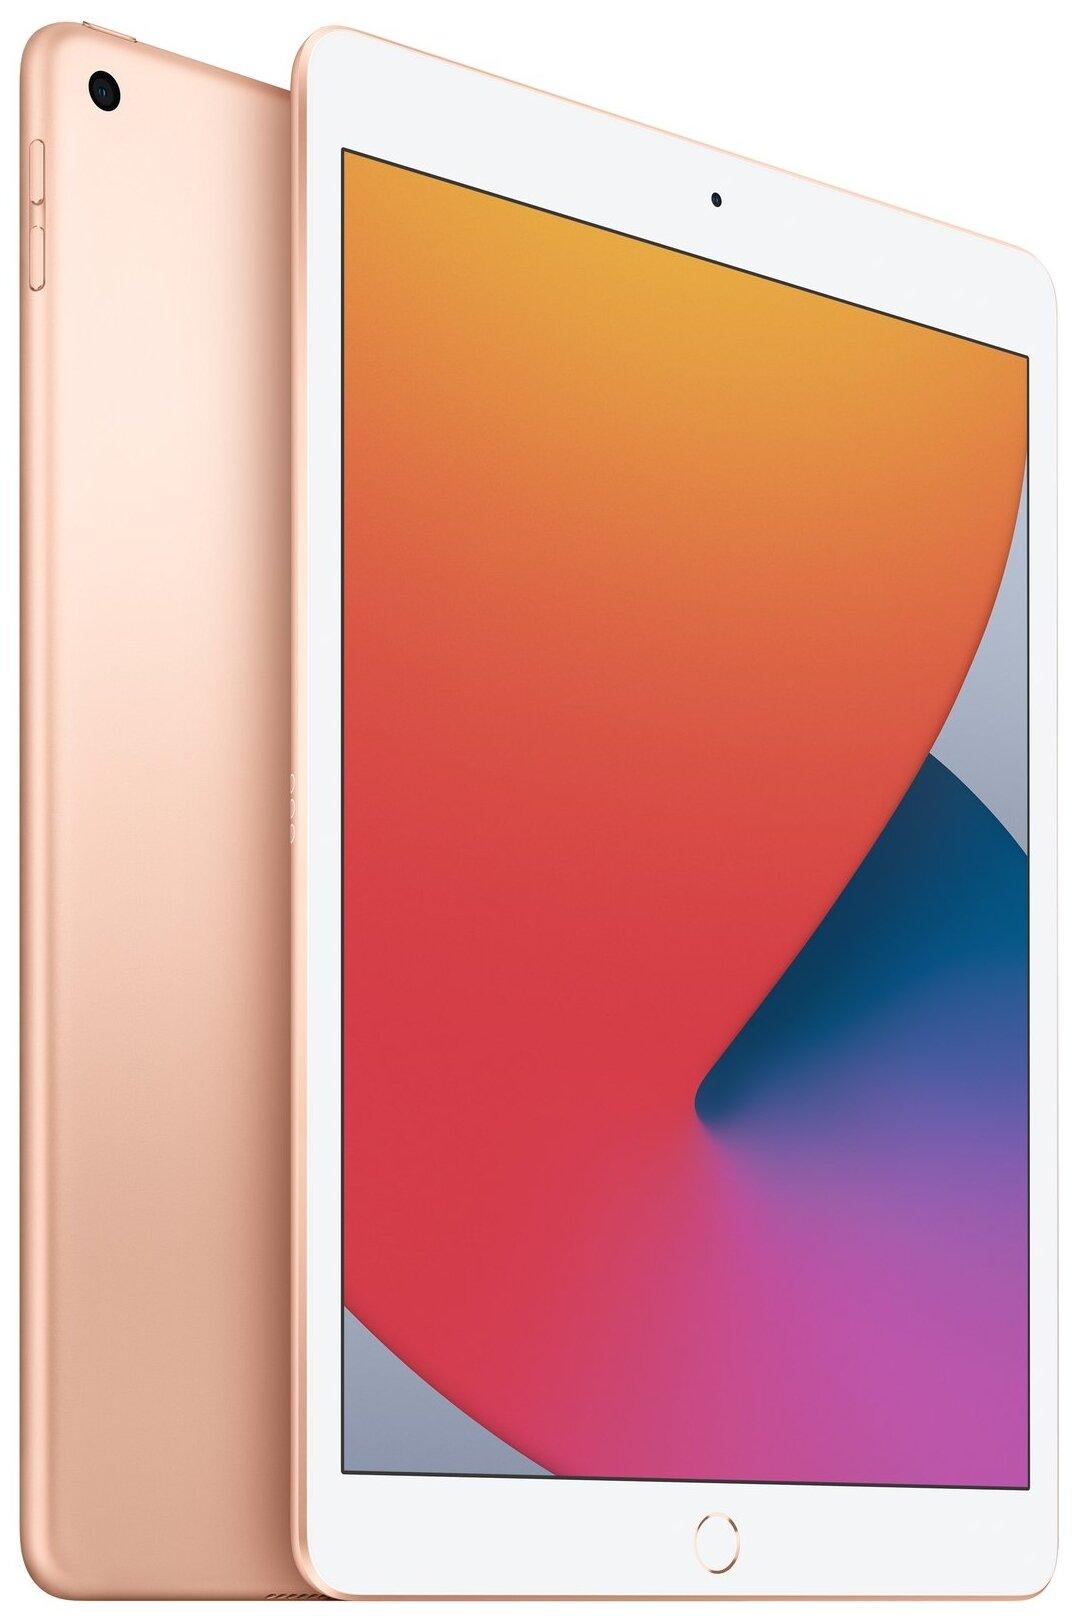 Apple iPad (2020) 128Gb Wi-Fi - размеры: 250.6x174.1x7.5мм, вес: 490г